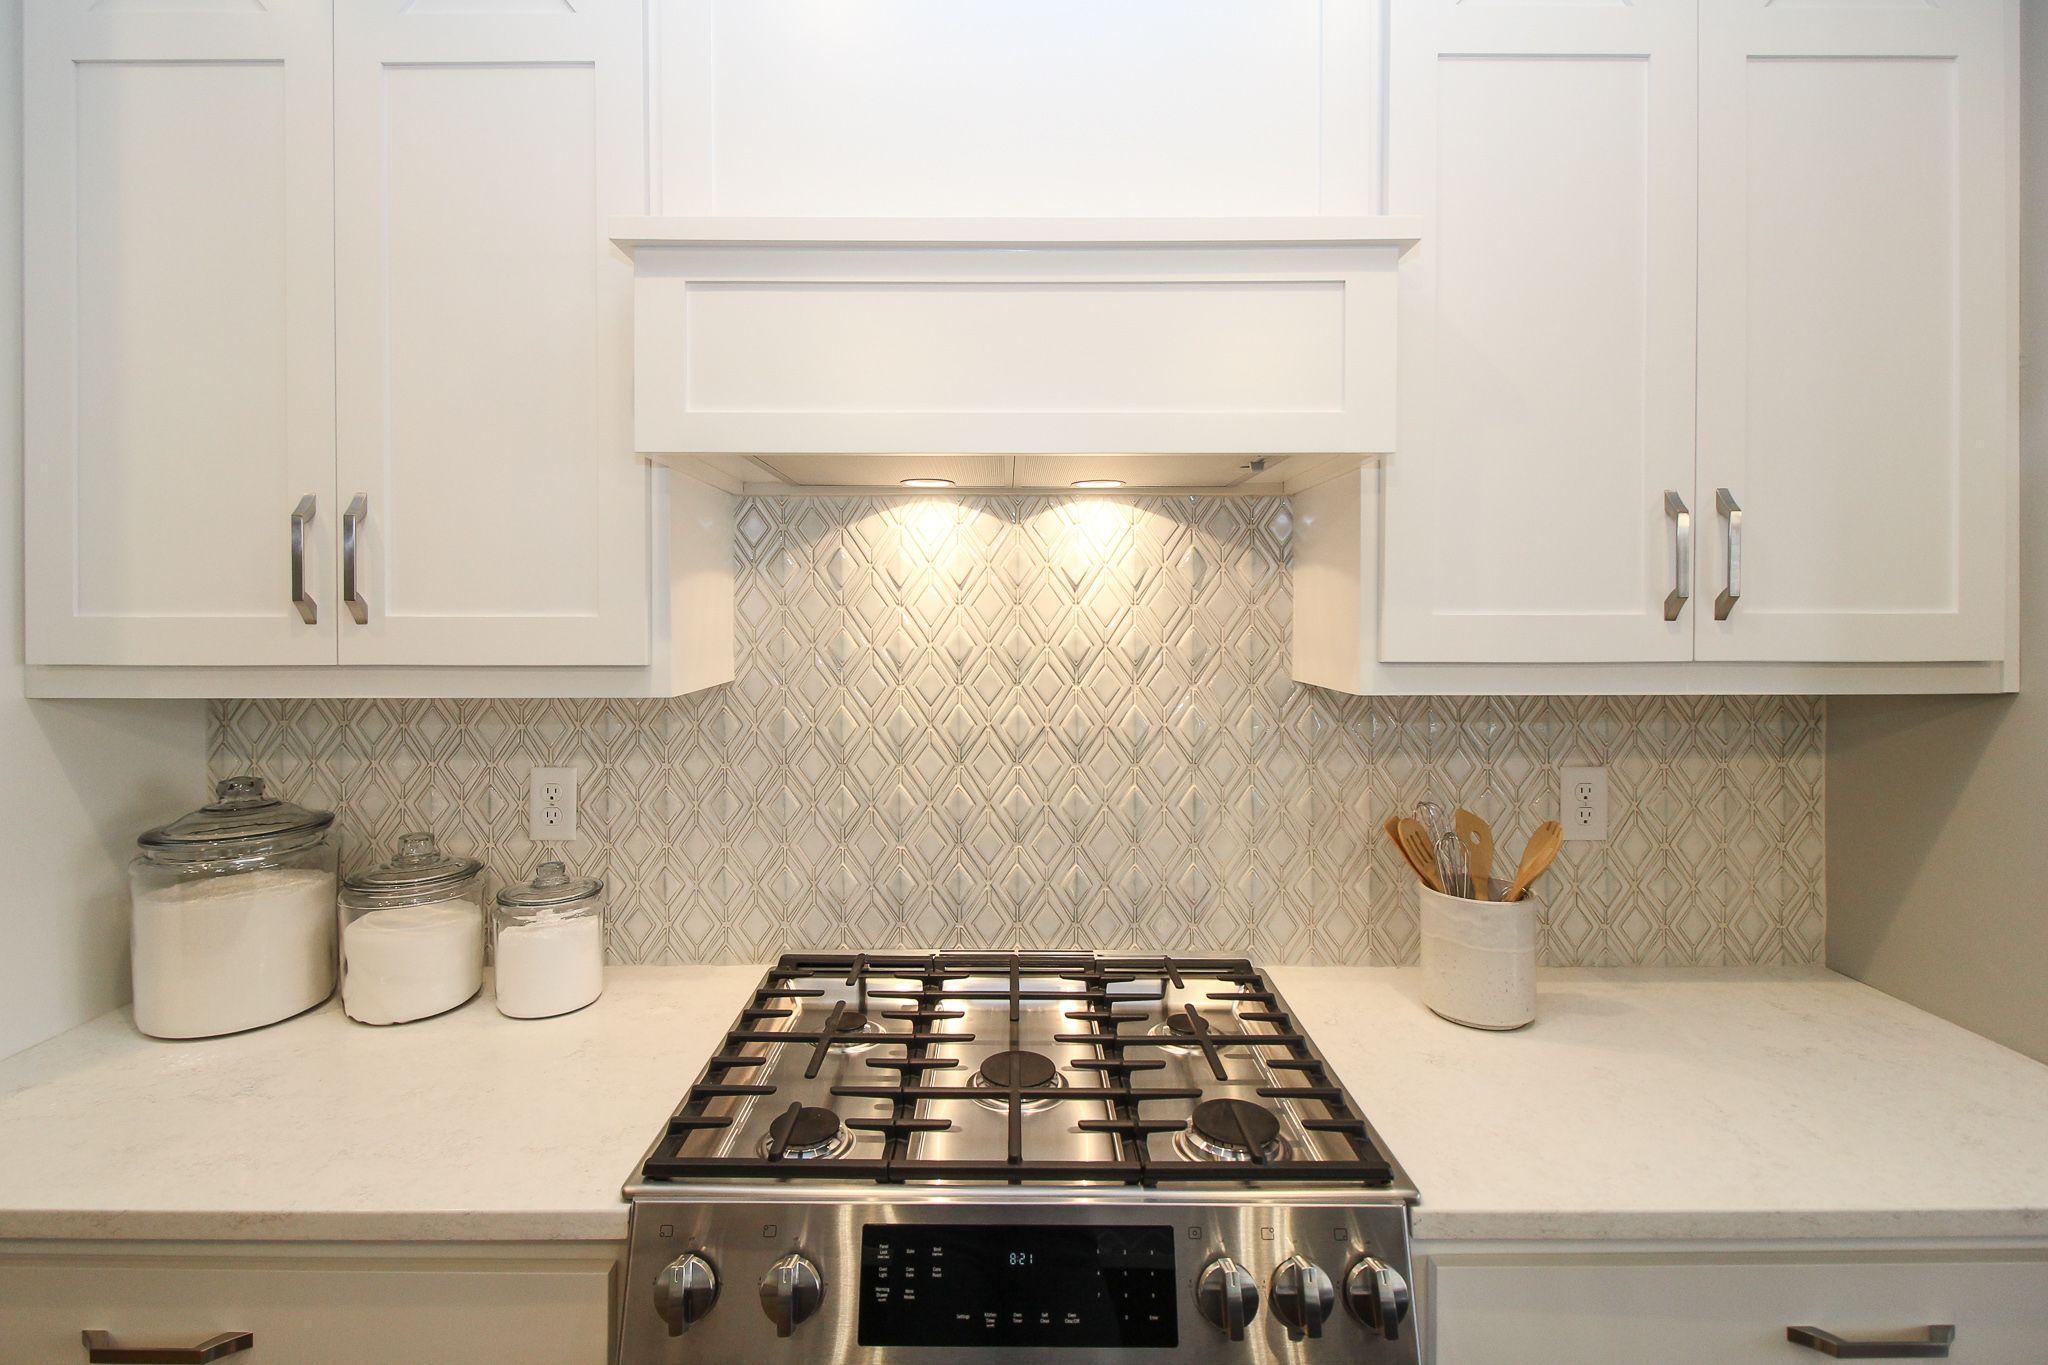 Elegant Kitchen Backsplash in 2020 White tile kitchen